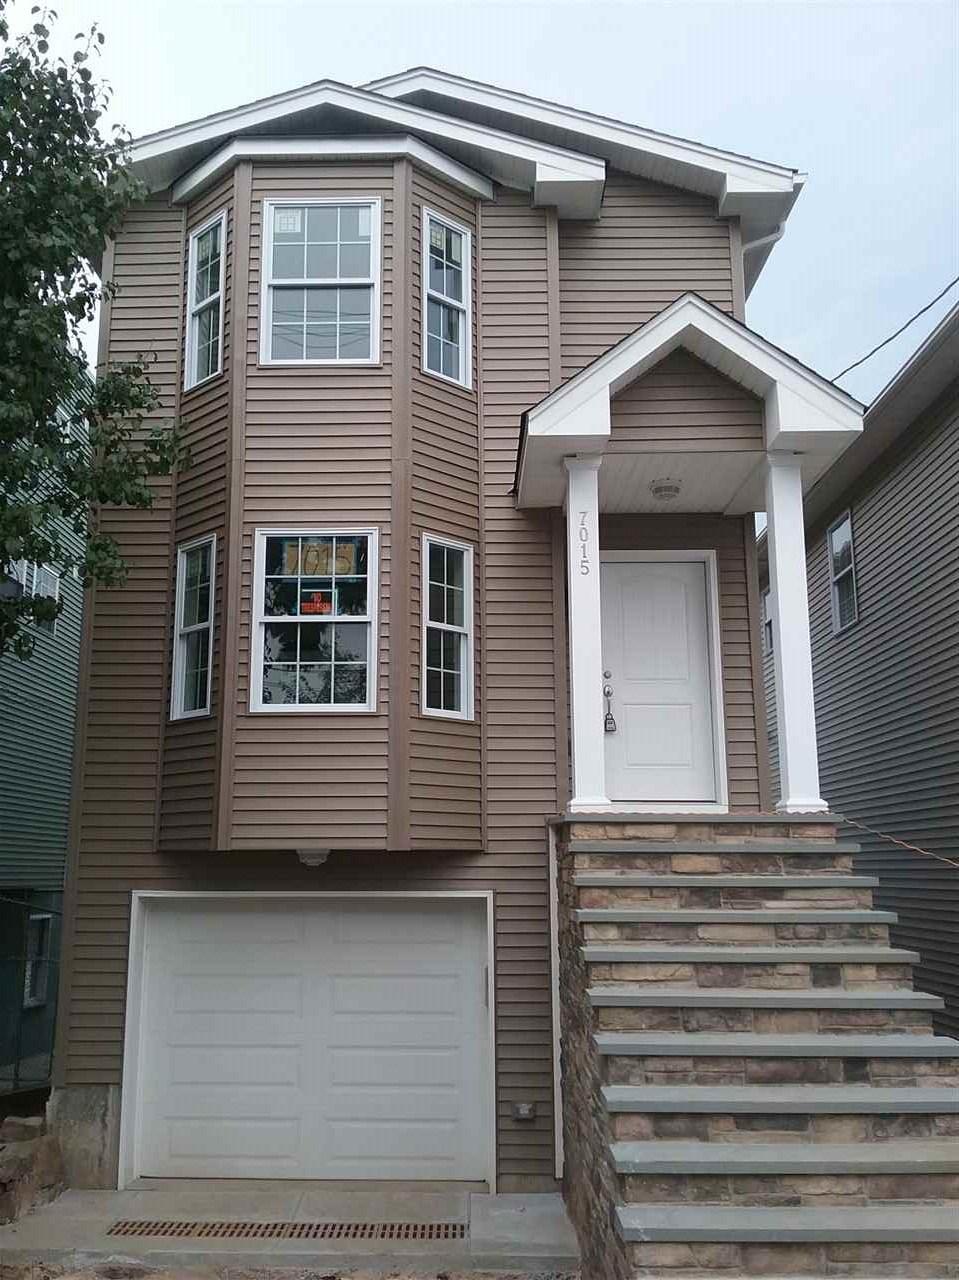 7015 SMITH AVE, North Bergen, NJ 07047